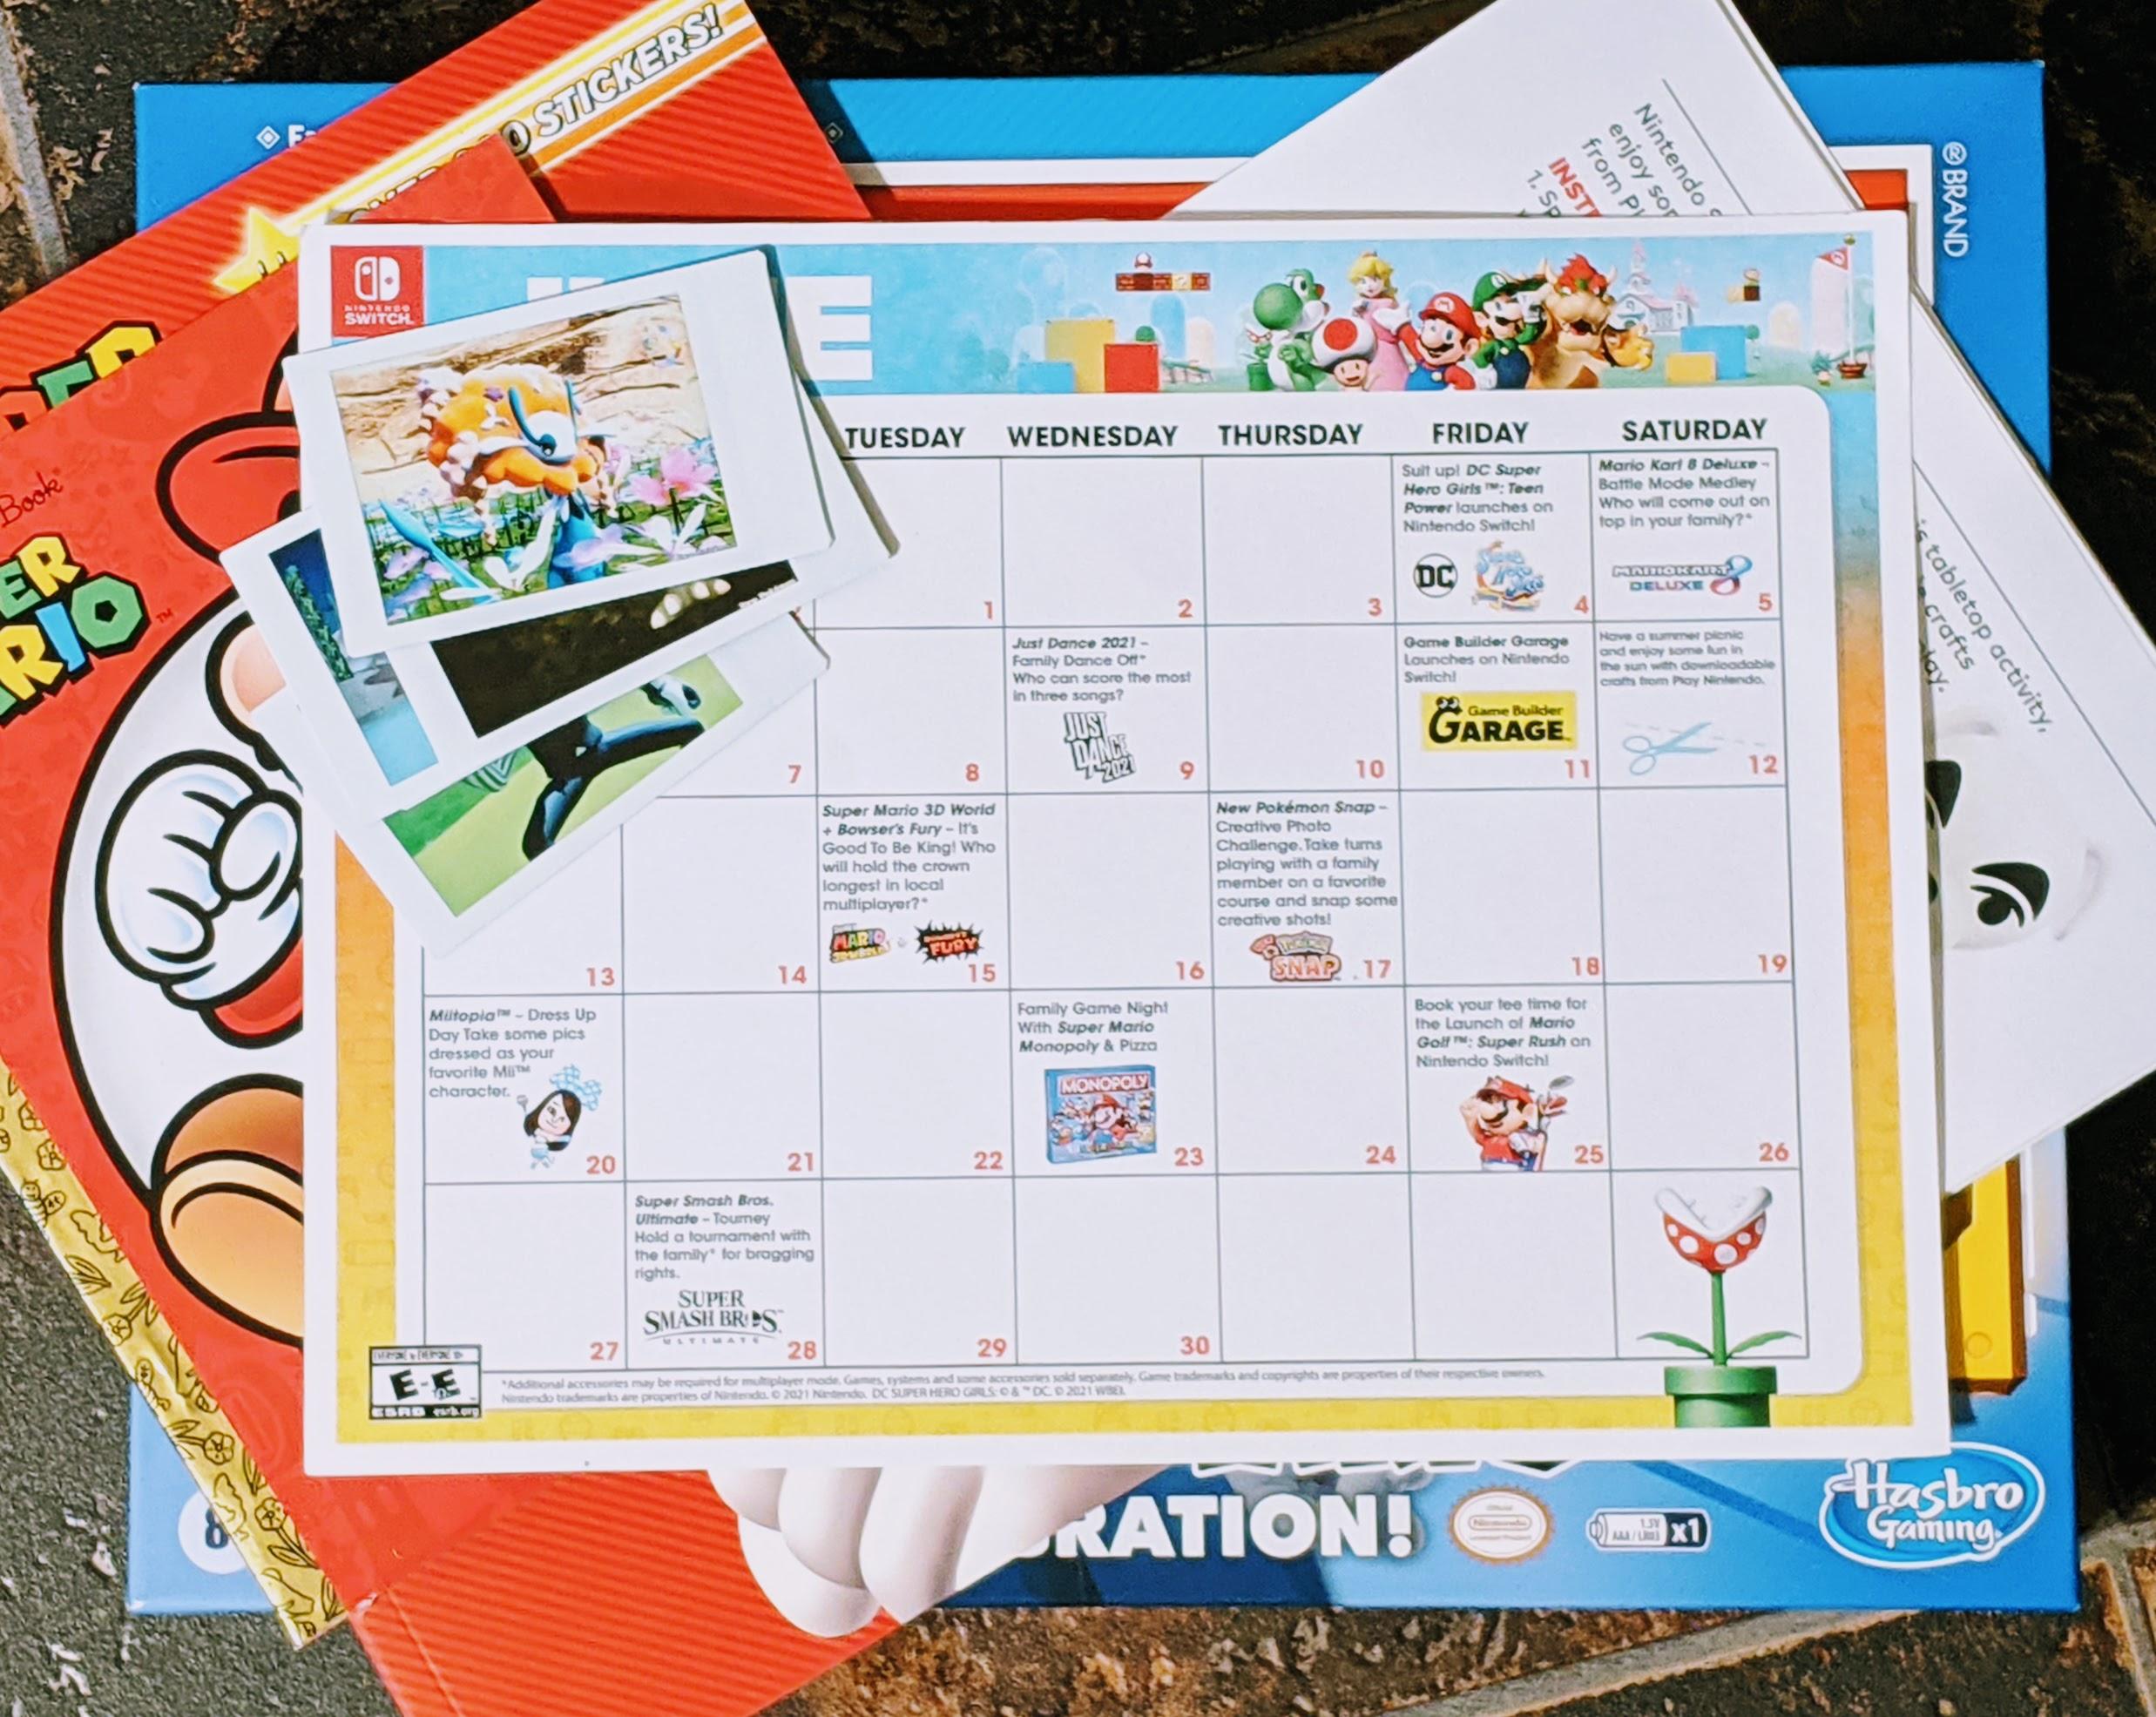 June Nintendo activity calendar